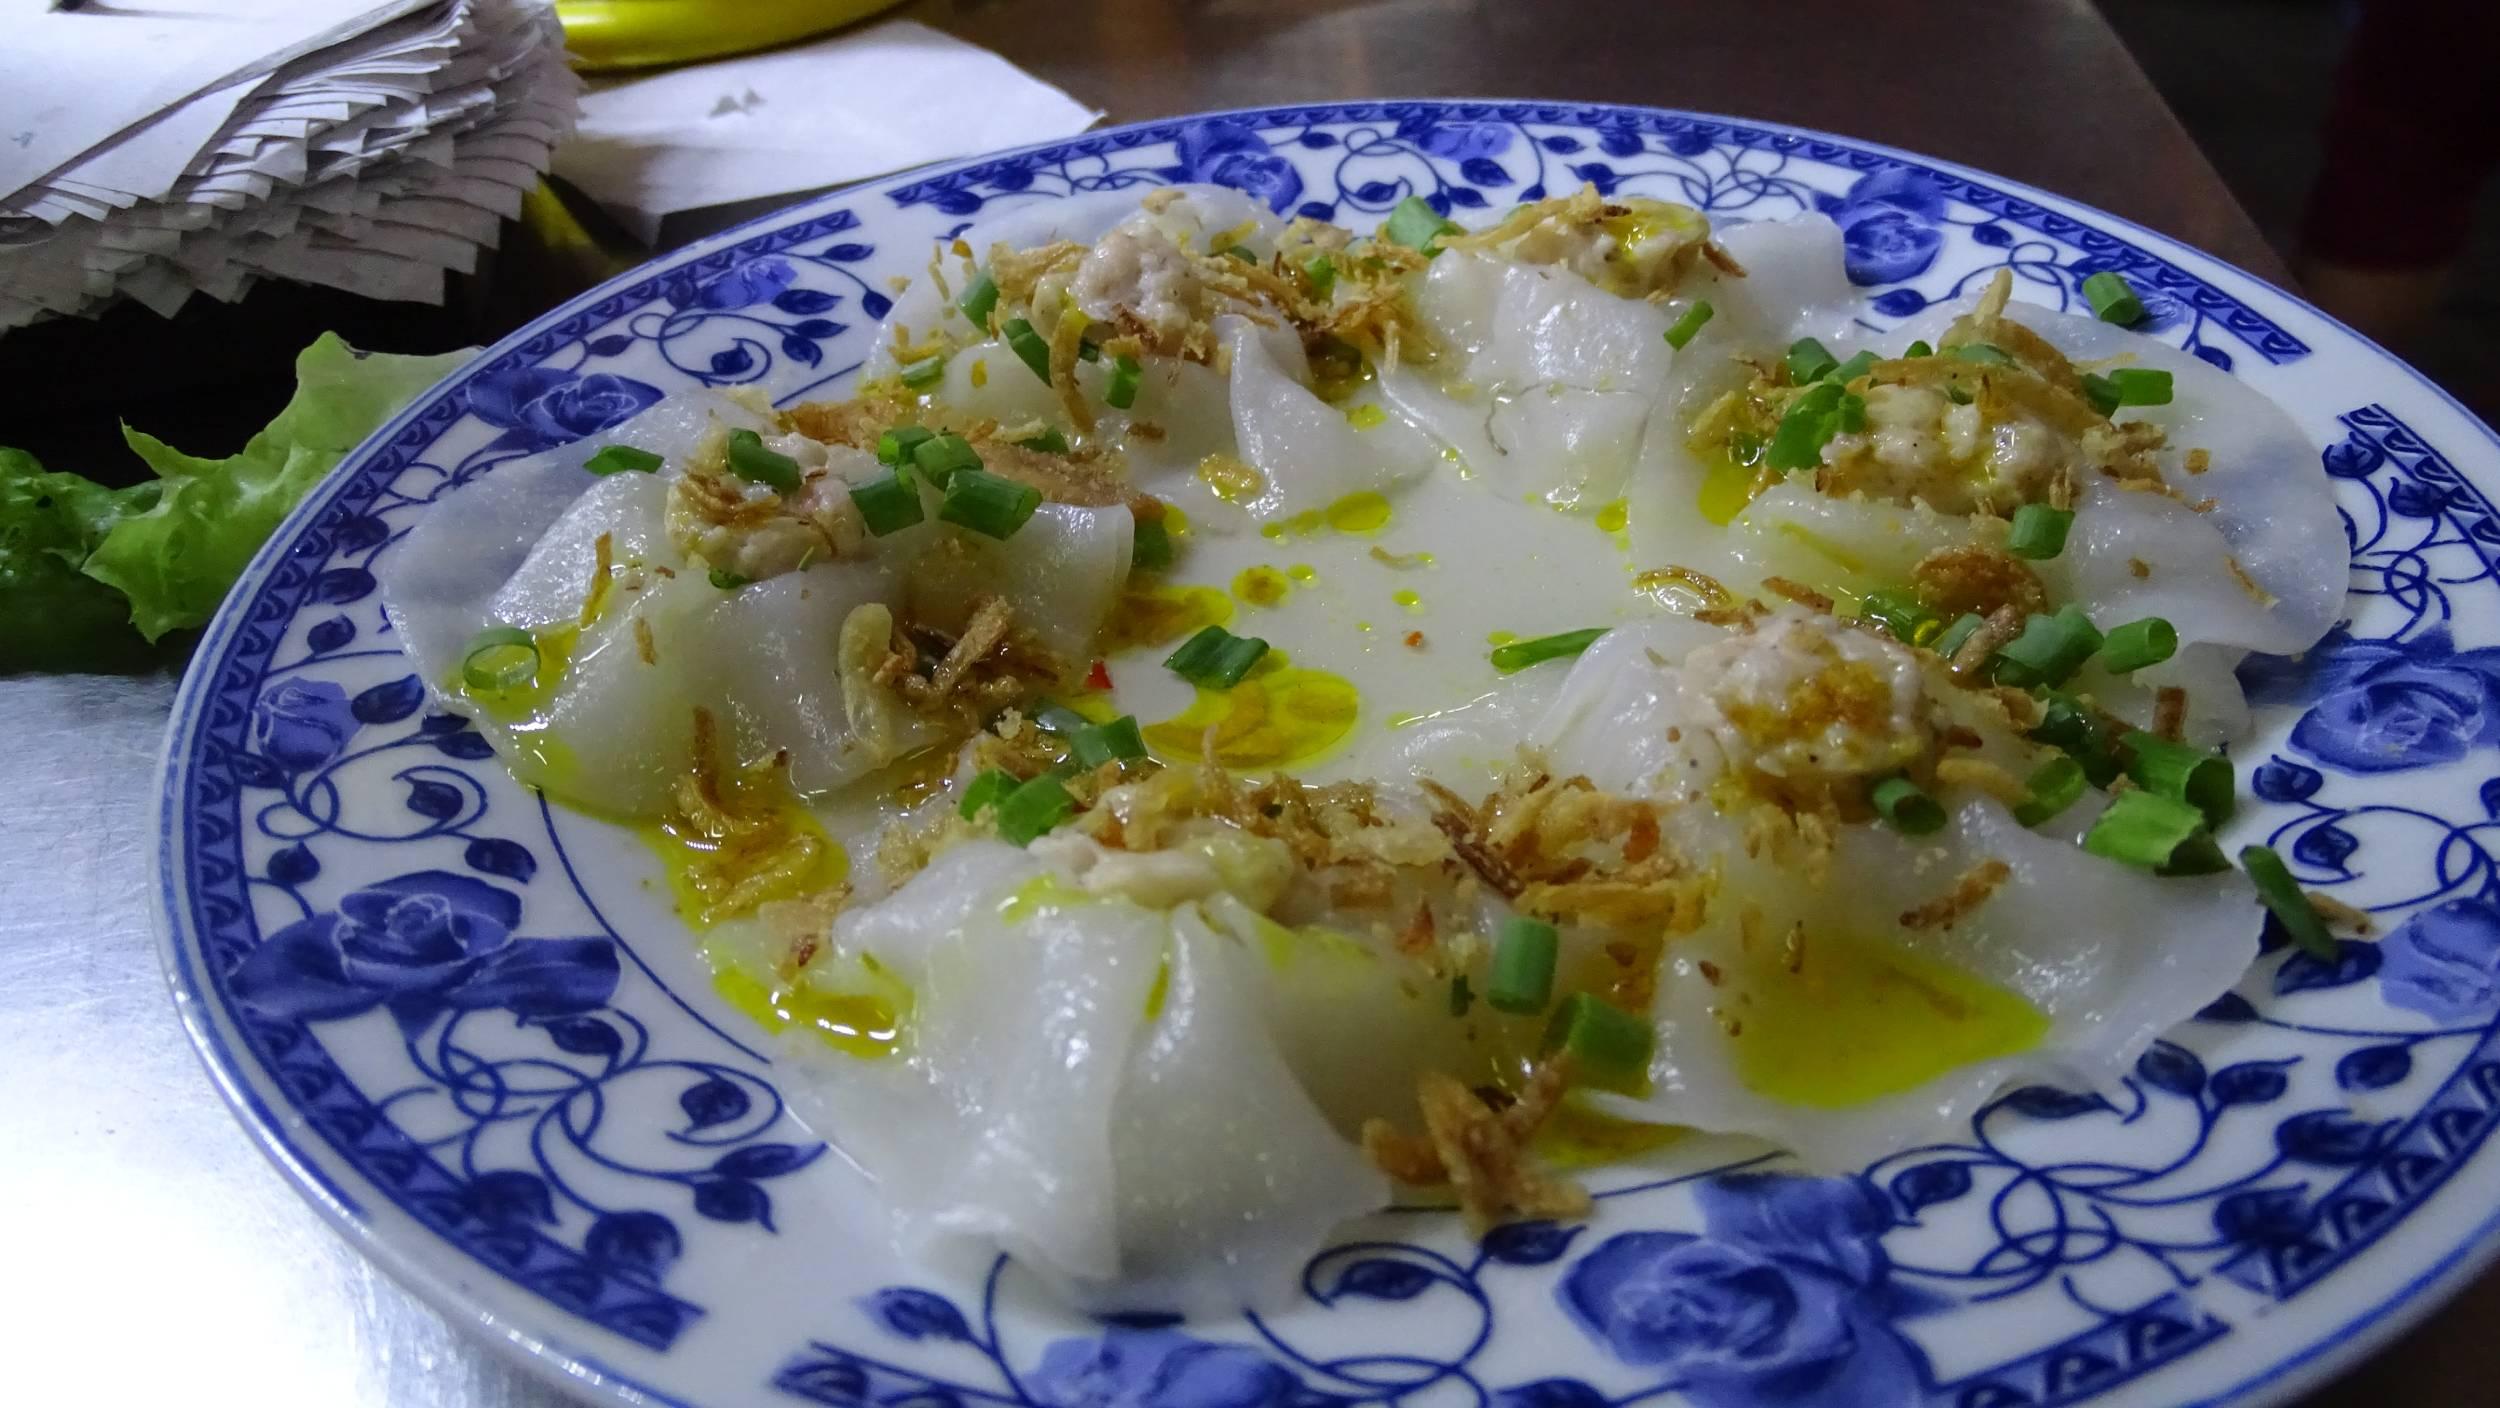 Vietnamese rice flour dumplings served on a china plate